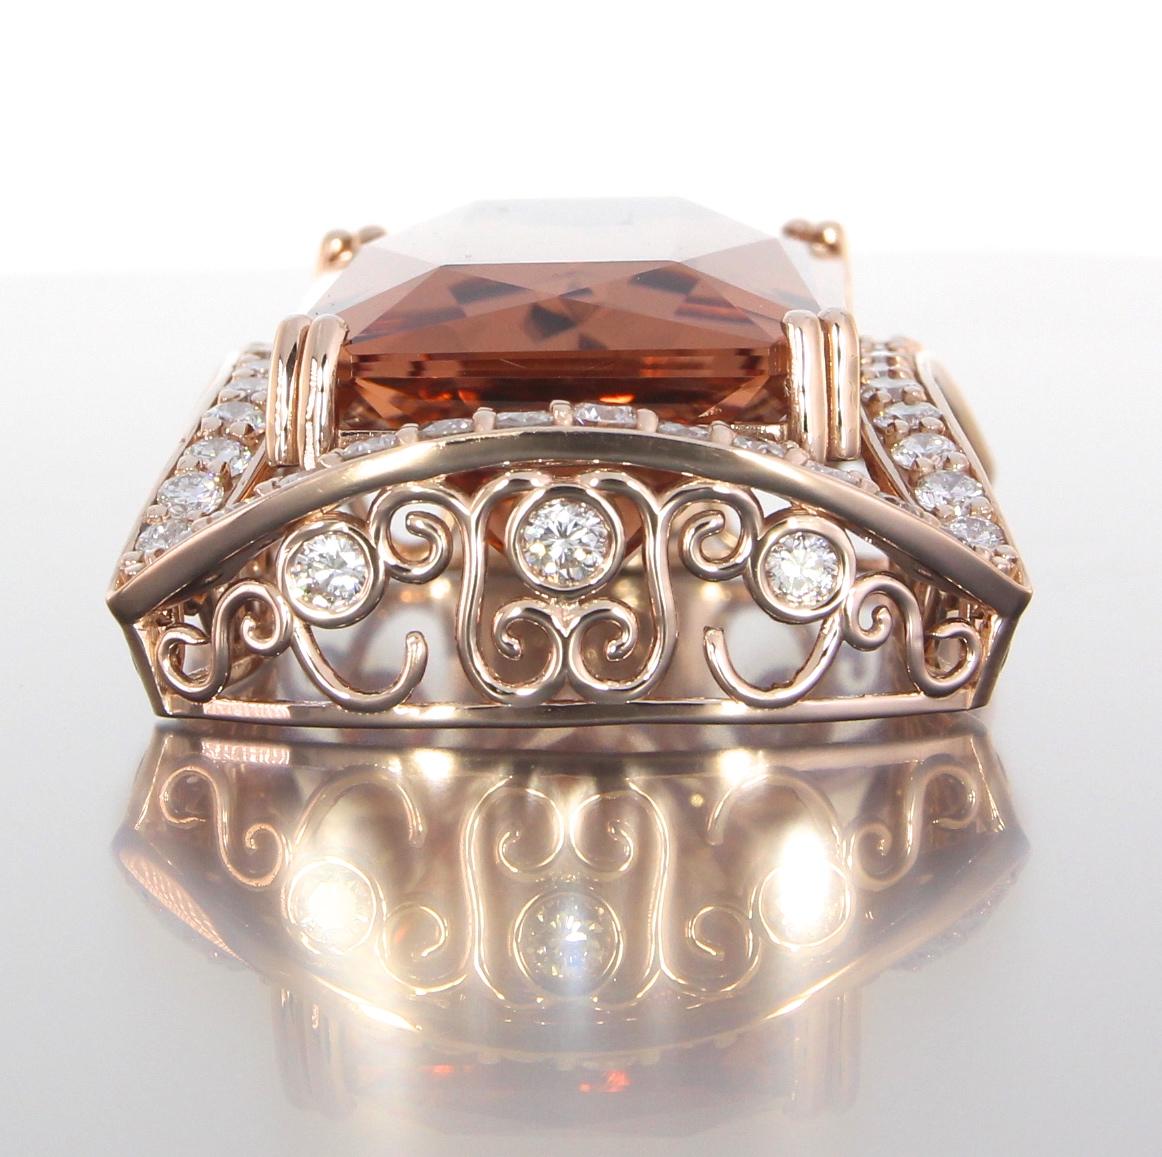 unique-custom-morganite-pendant-rose-gold-diamonds-halo-pendant-side-view-craft-revival-jewelry-store-grand-rapids-top-view